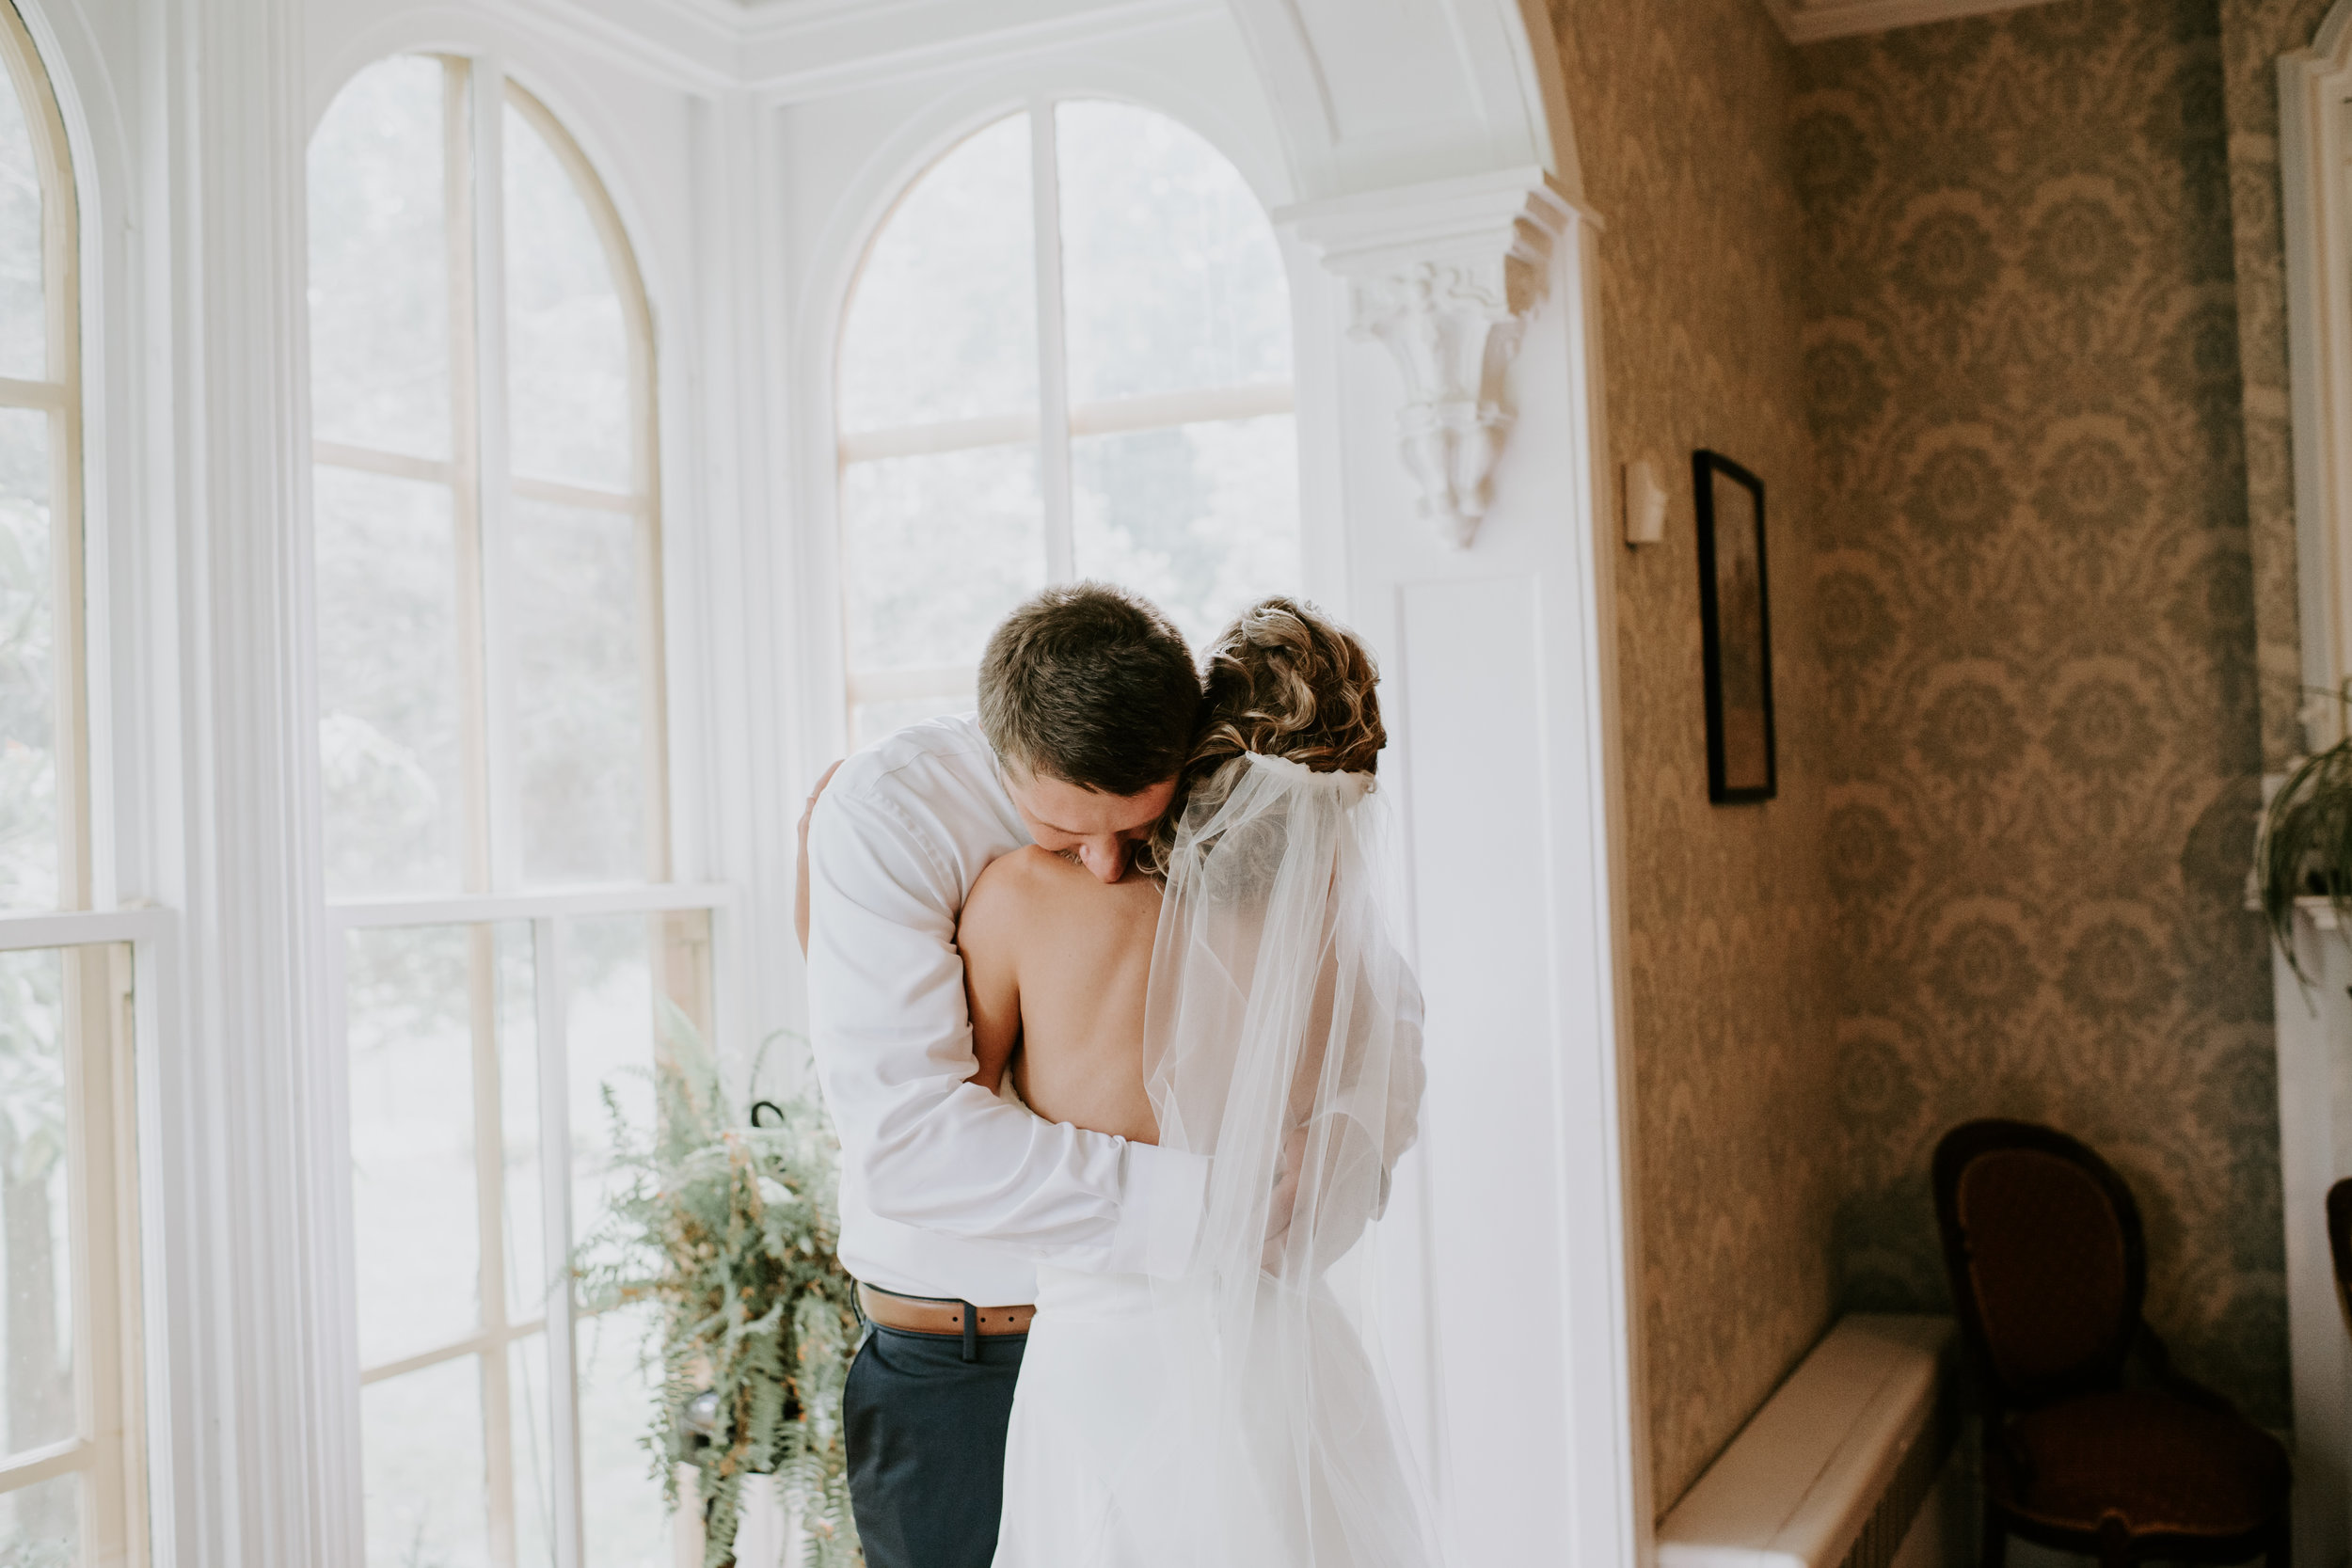 APD_chris_justin_wedding-125 copy.jpg